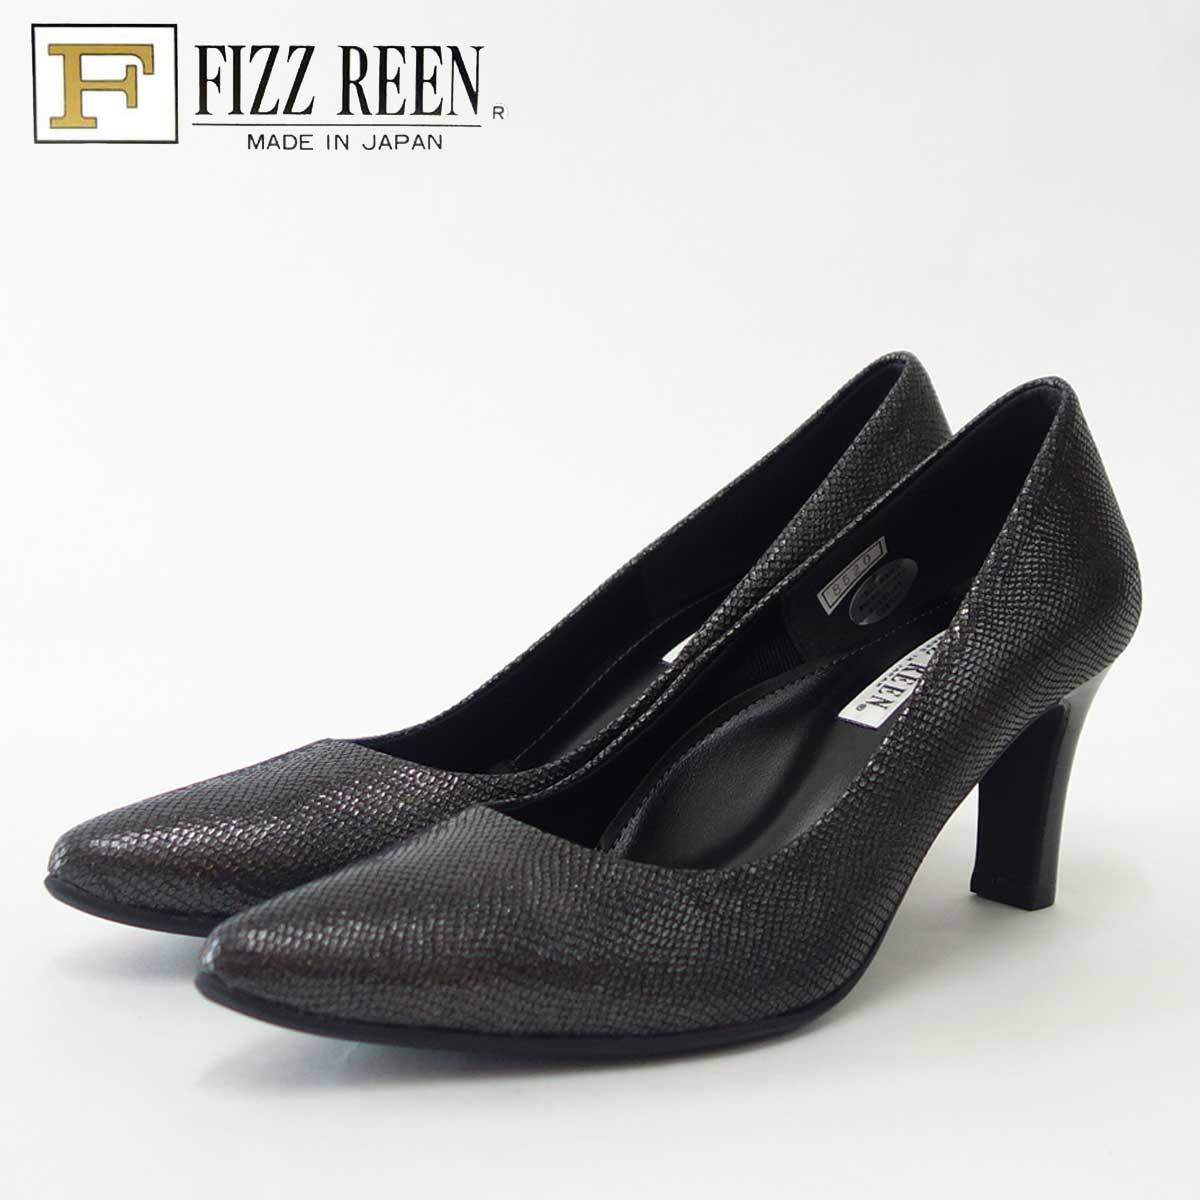 FIZZ REEN フィズリーン 8520 エタン(レディース)スタイリッシュな快適パンプス「靴」